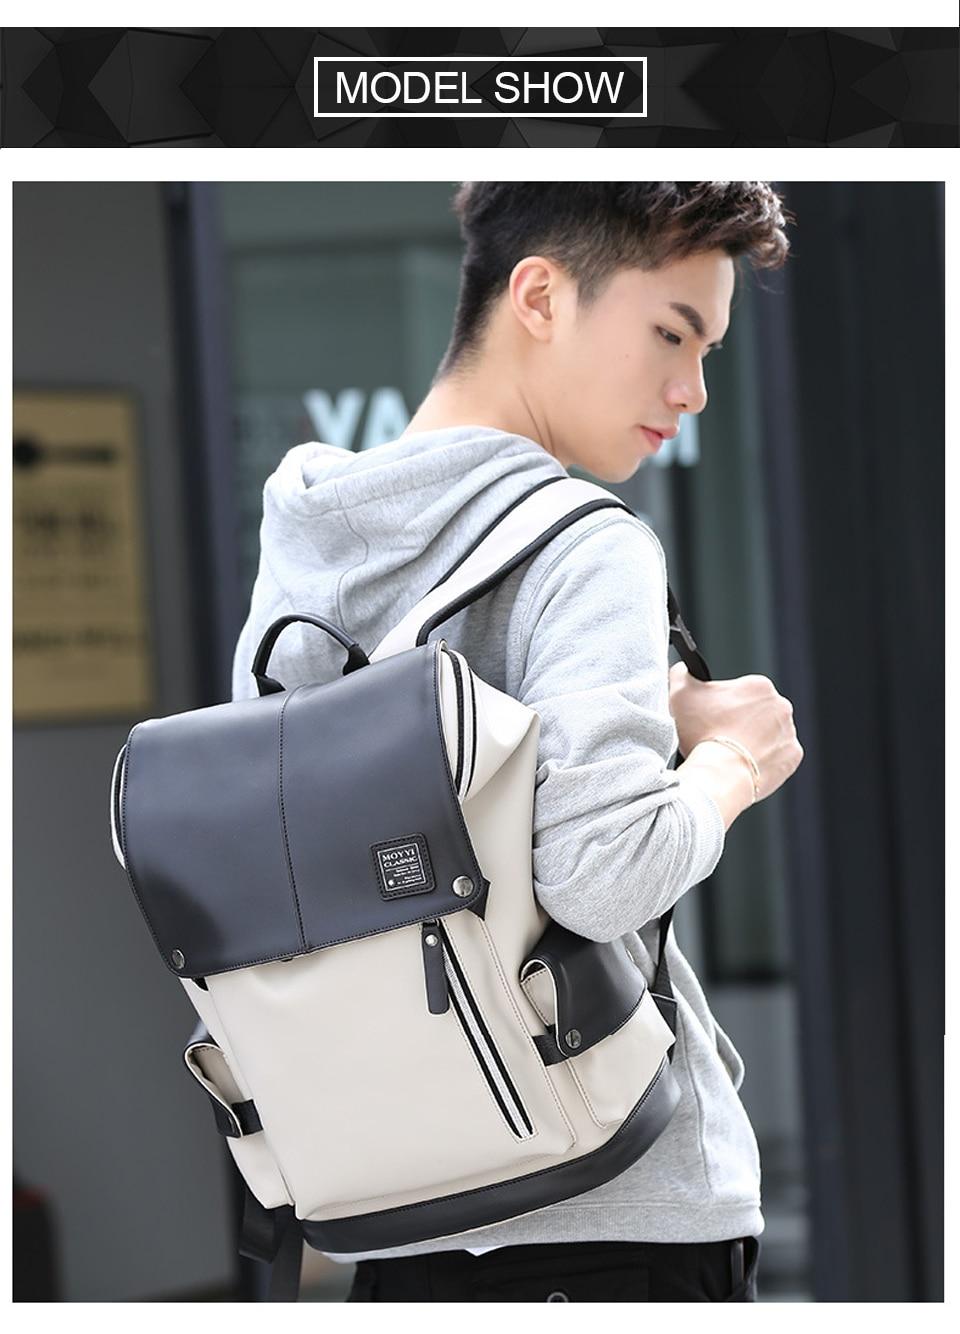 Cuir PU-Sac à dos-Hommes-Ordinateur portable-17-Pouces-Sac à dos-15.6-Homme-Femmes-Sacs-à-dos-Étanche-Bagpack-USB-Charging-Notebook-Bag_15